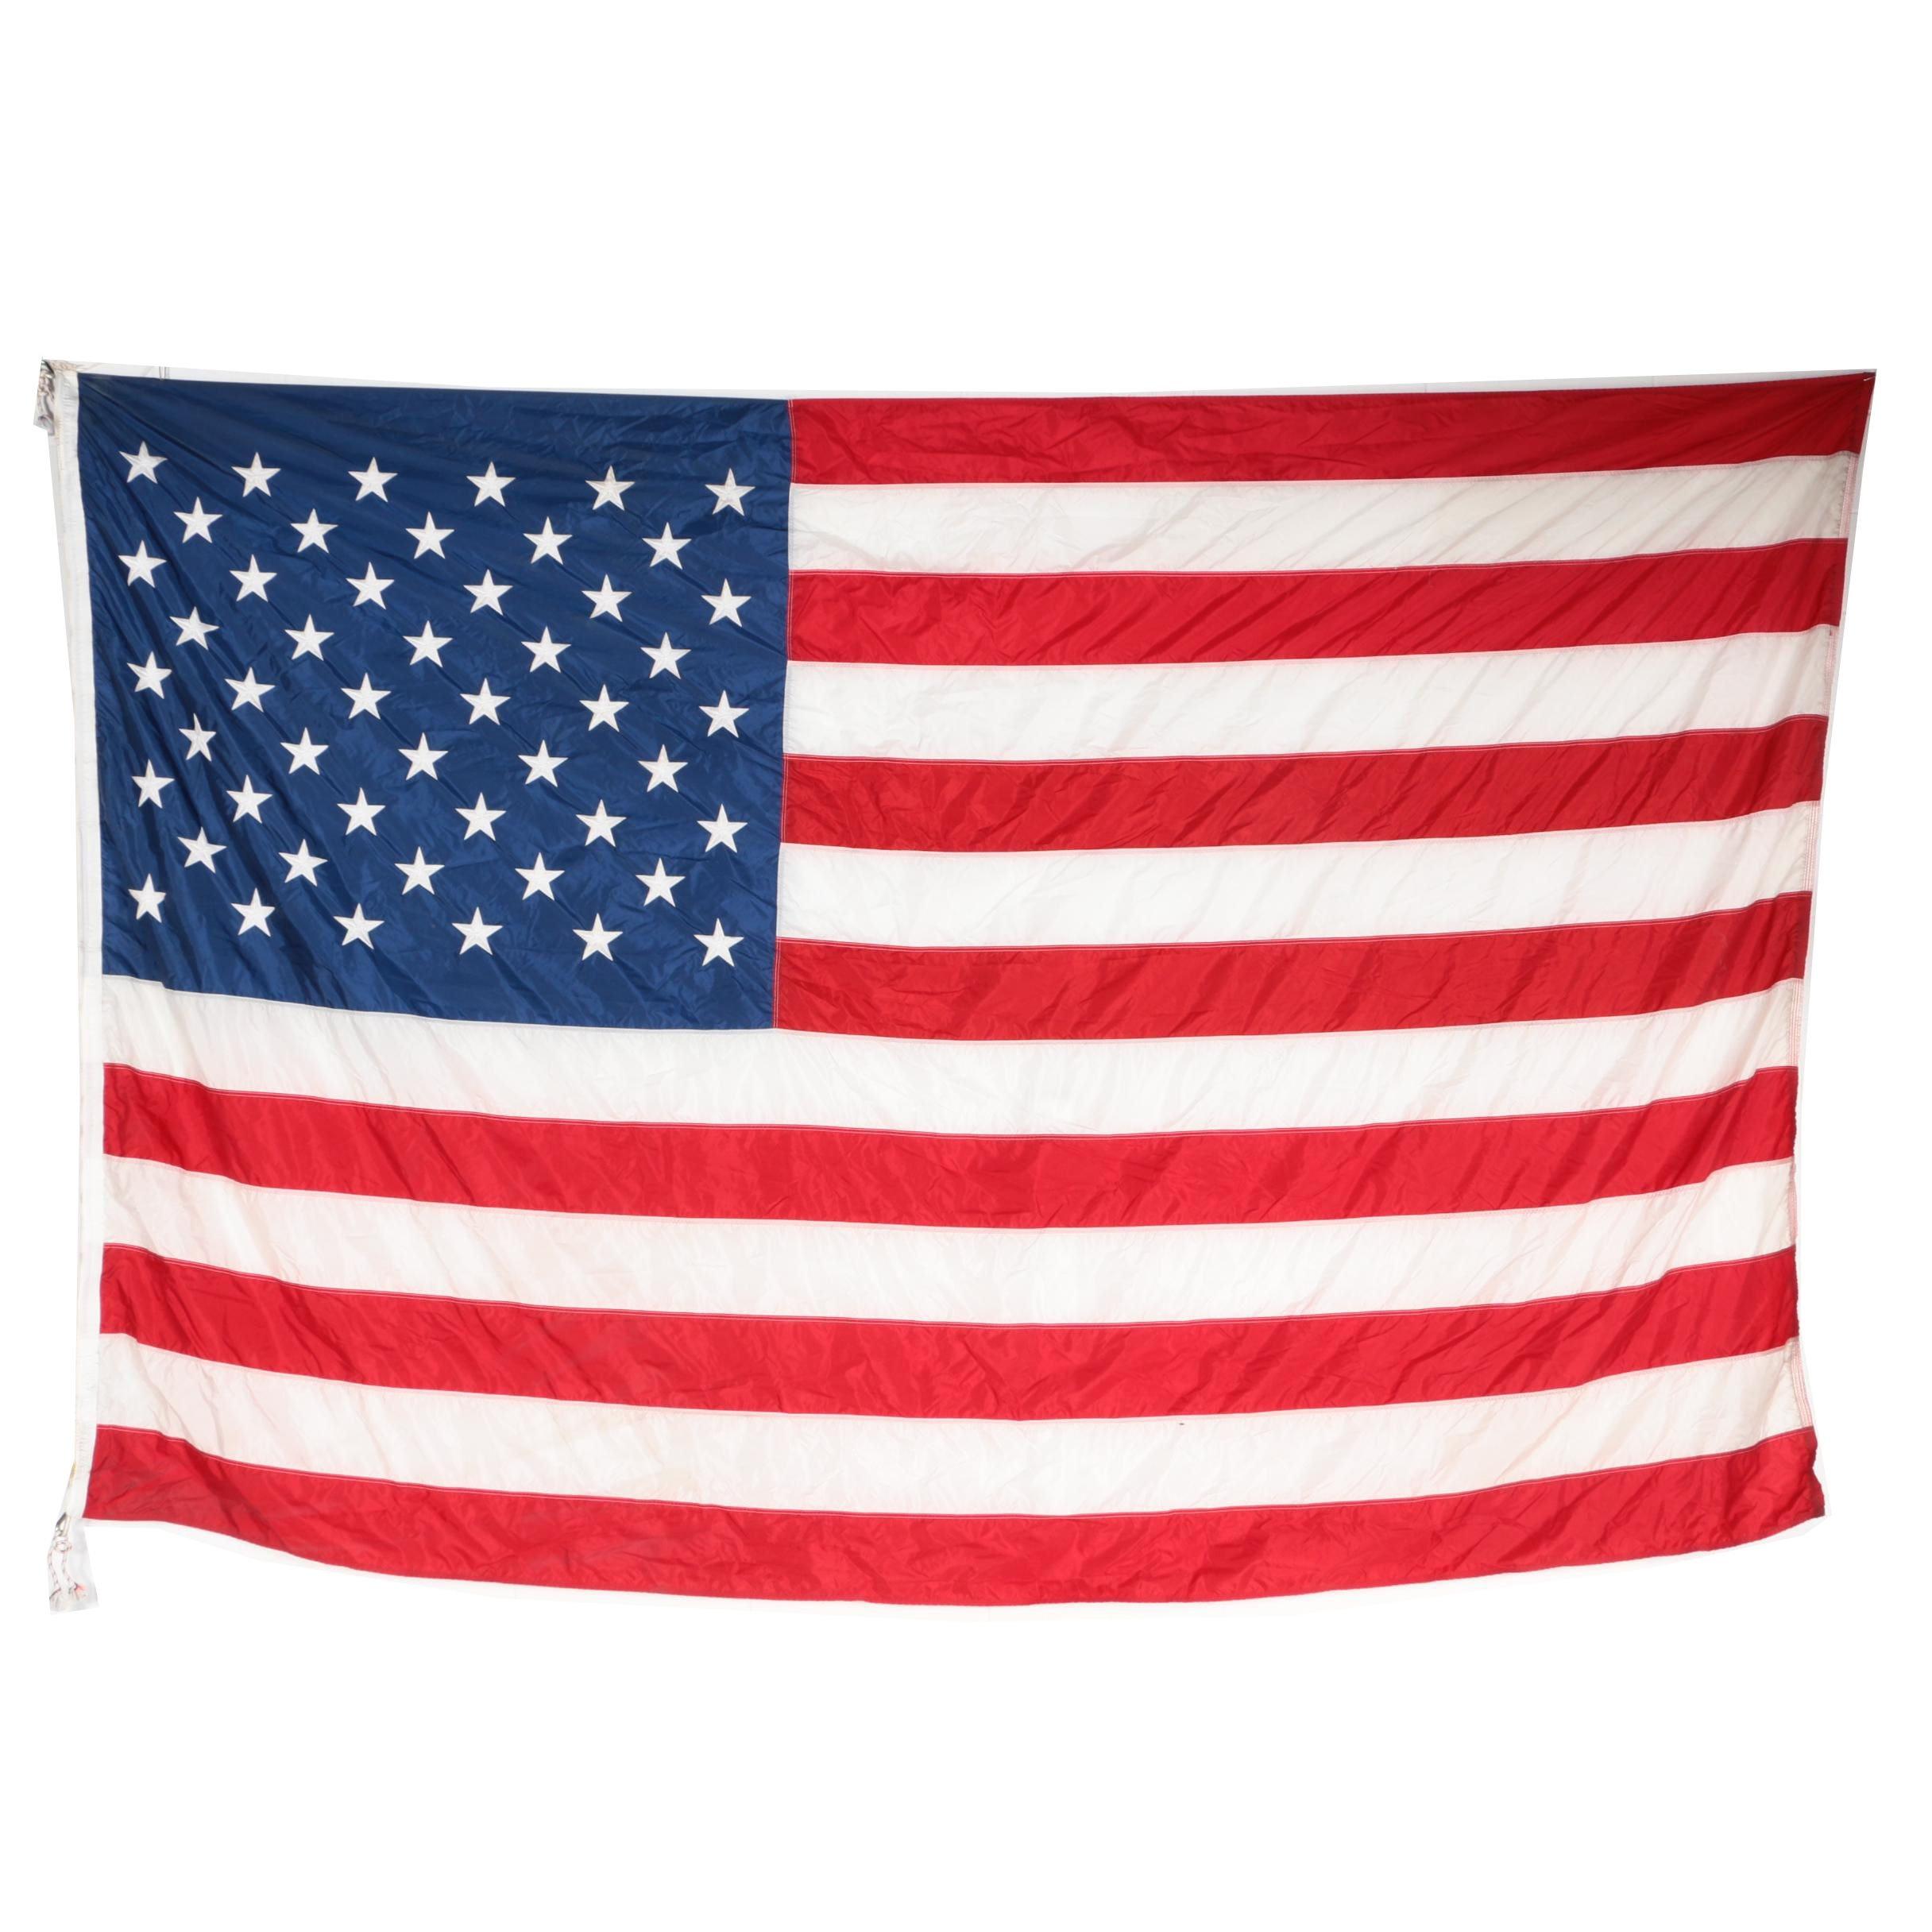 8' x 12' Nylon American Flag